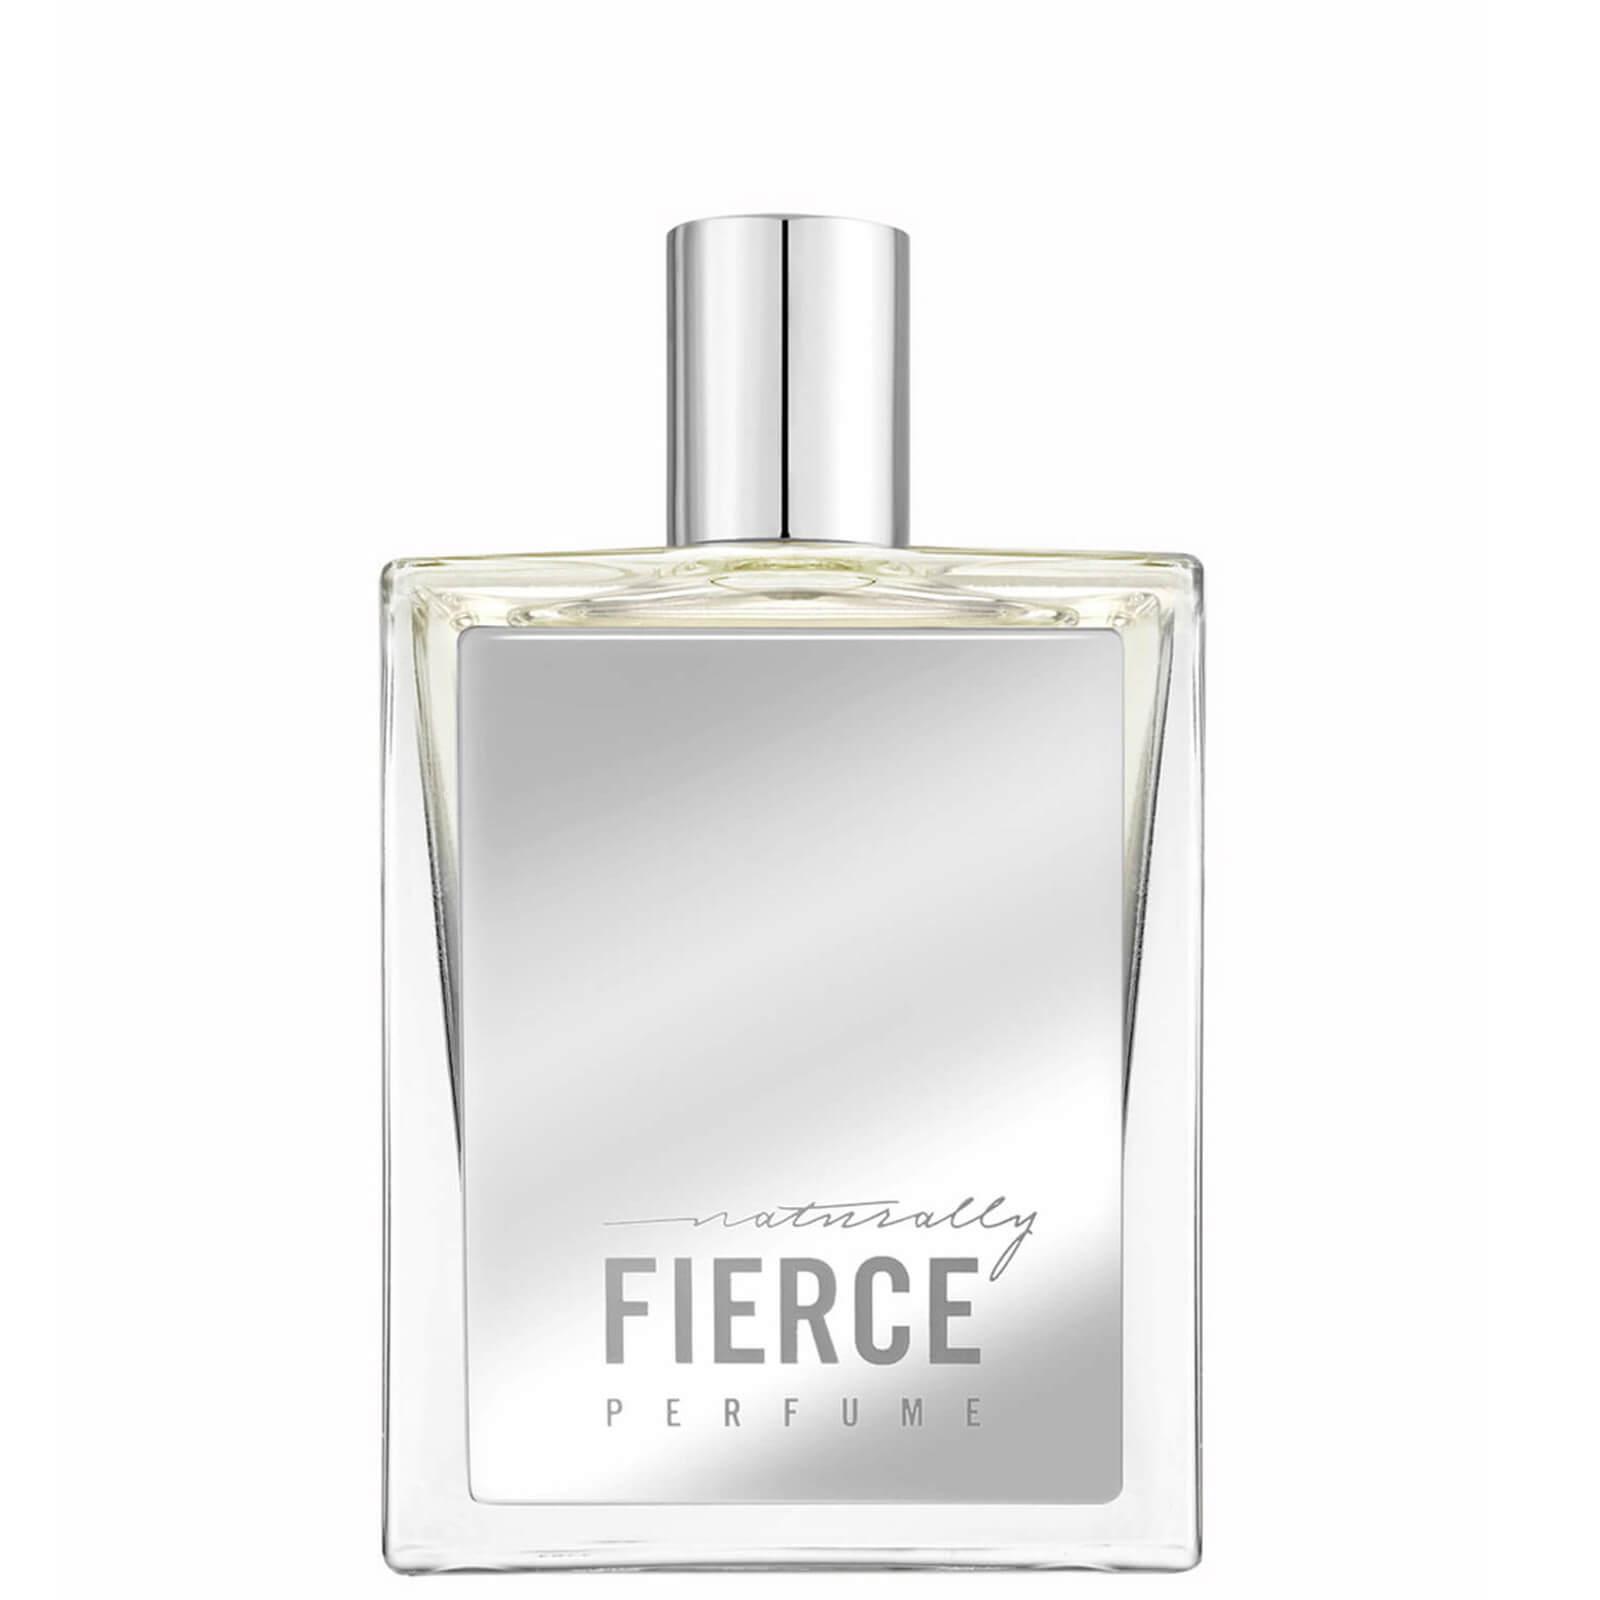 Купить Духи Abercrombie & Fitch Naturally Fierce Eau de Parfum 100ml